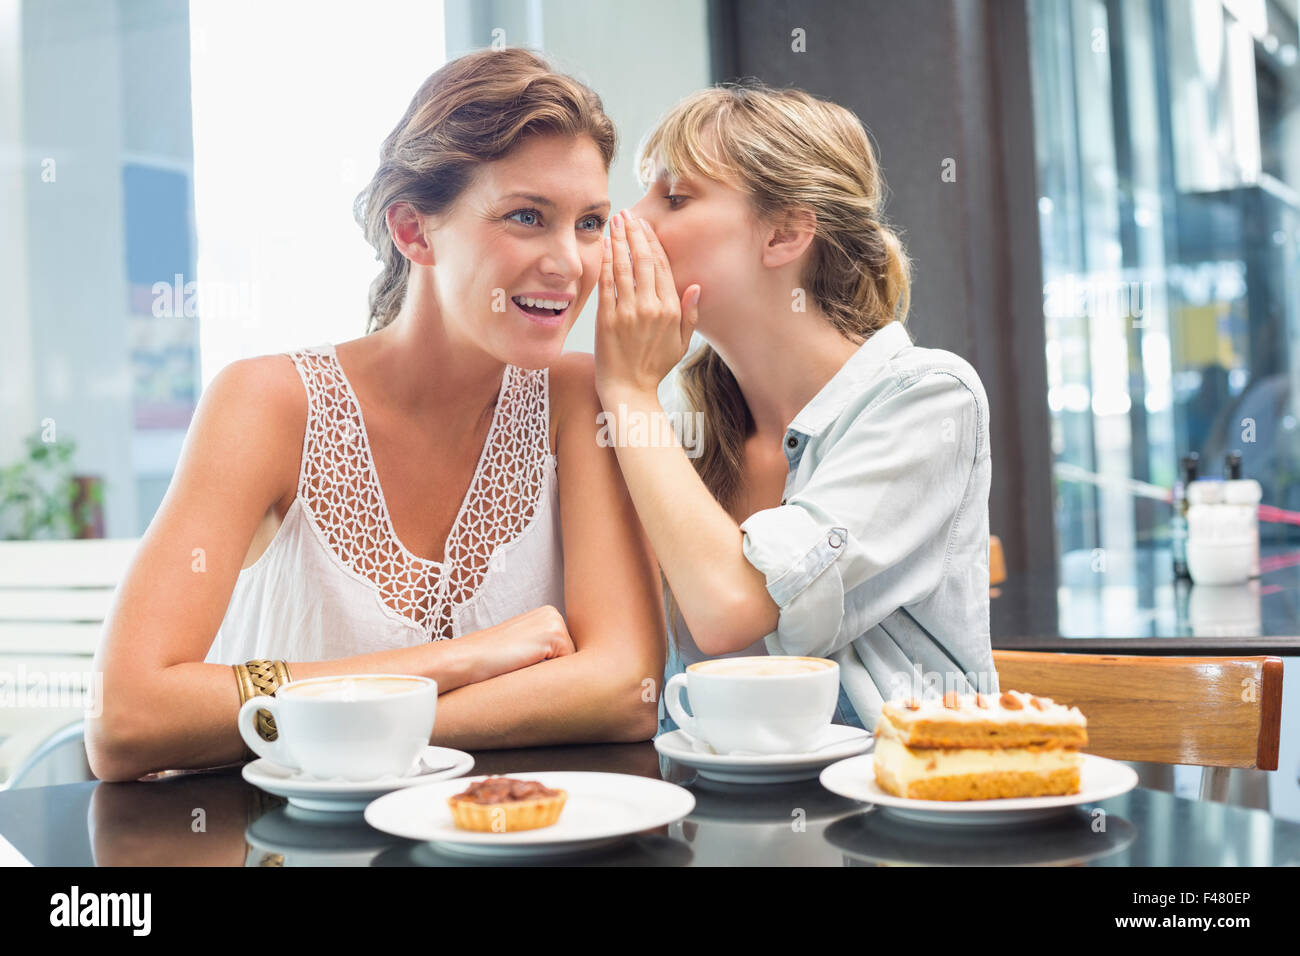 Beautiful women sitting and whispering secrets - Stock Image